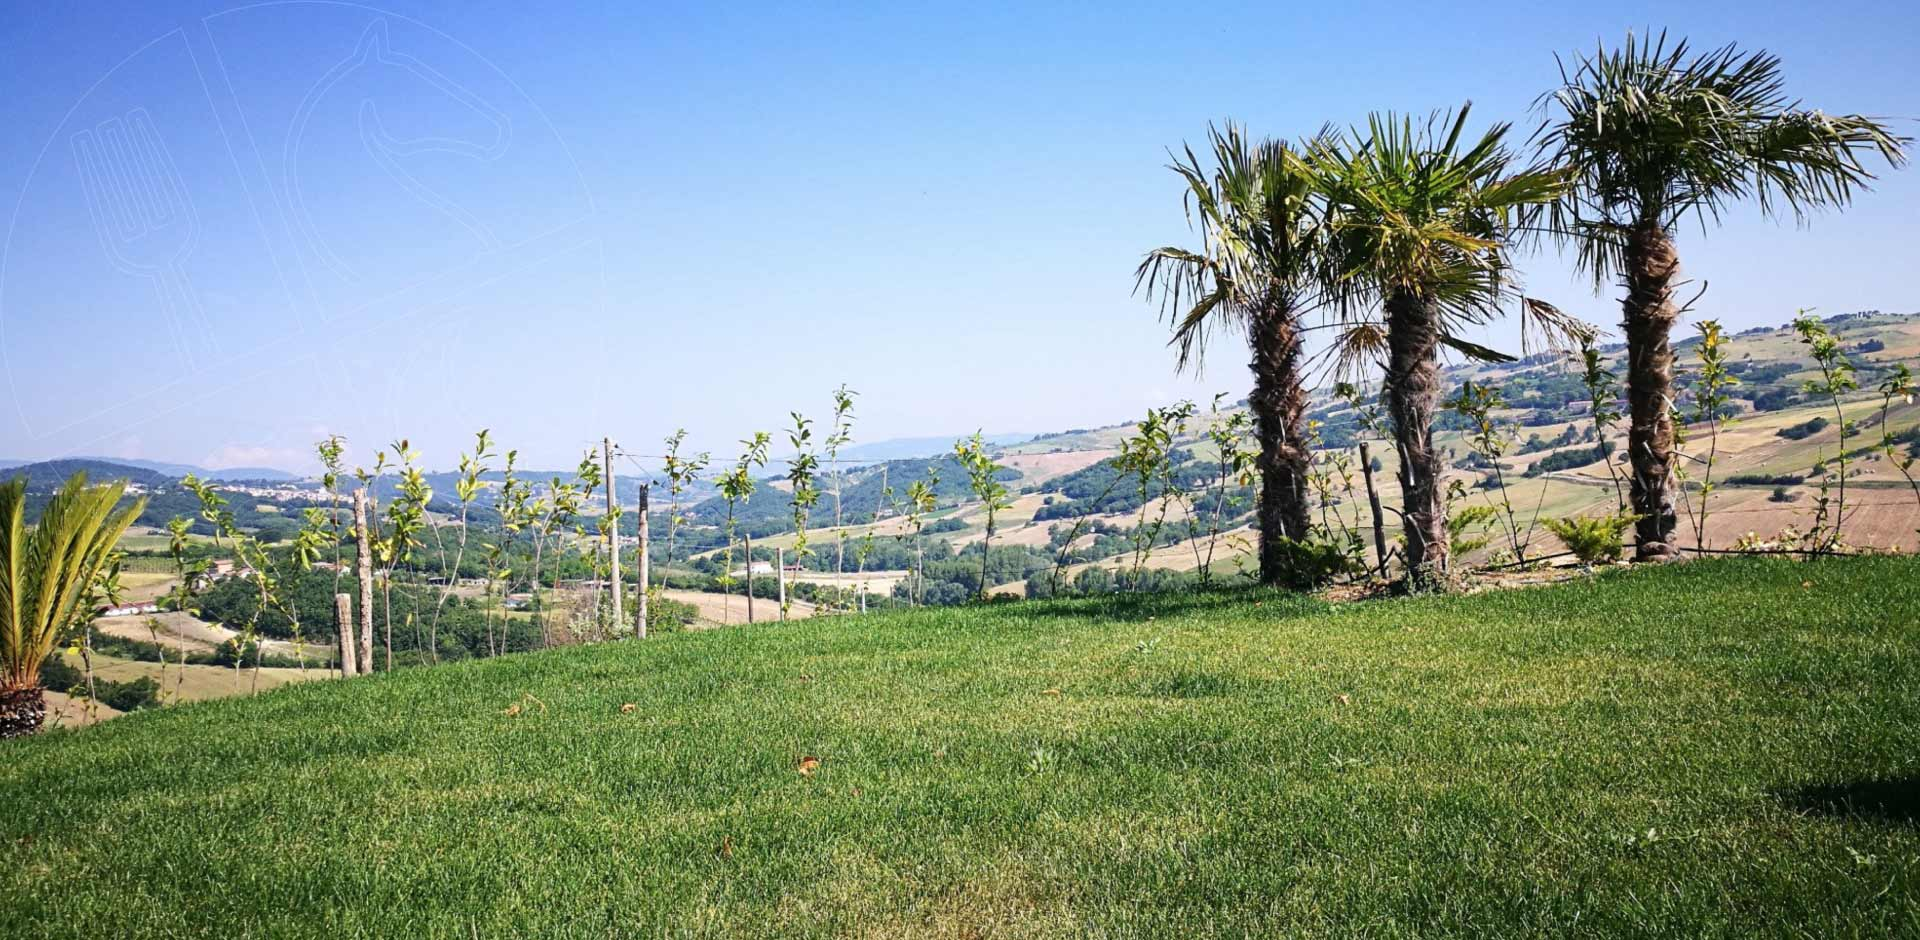 agriturismo la mongolfiera Fragneto Monforte Benevento